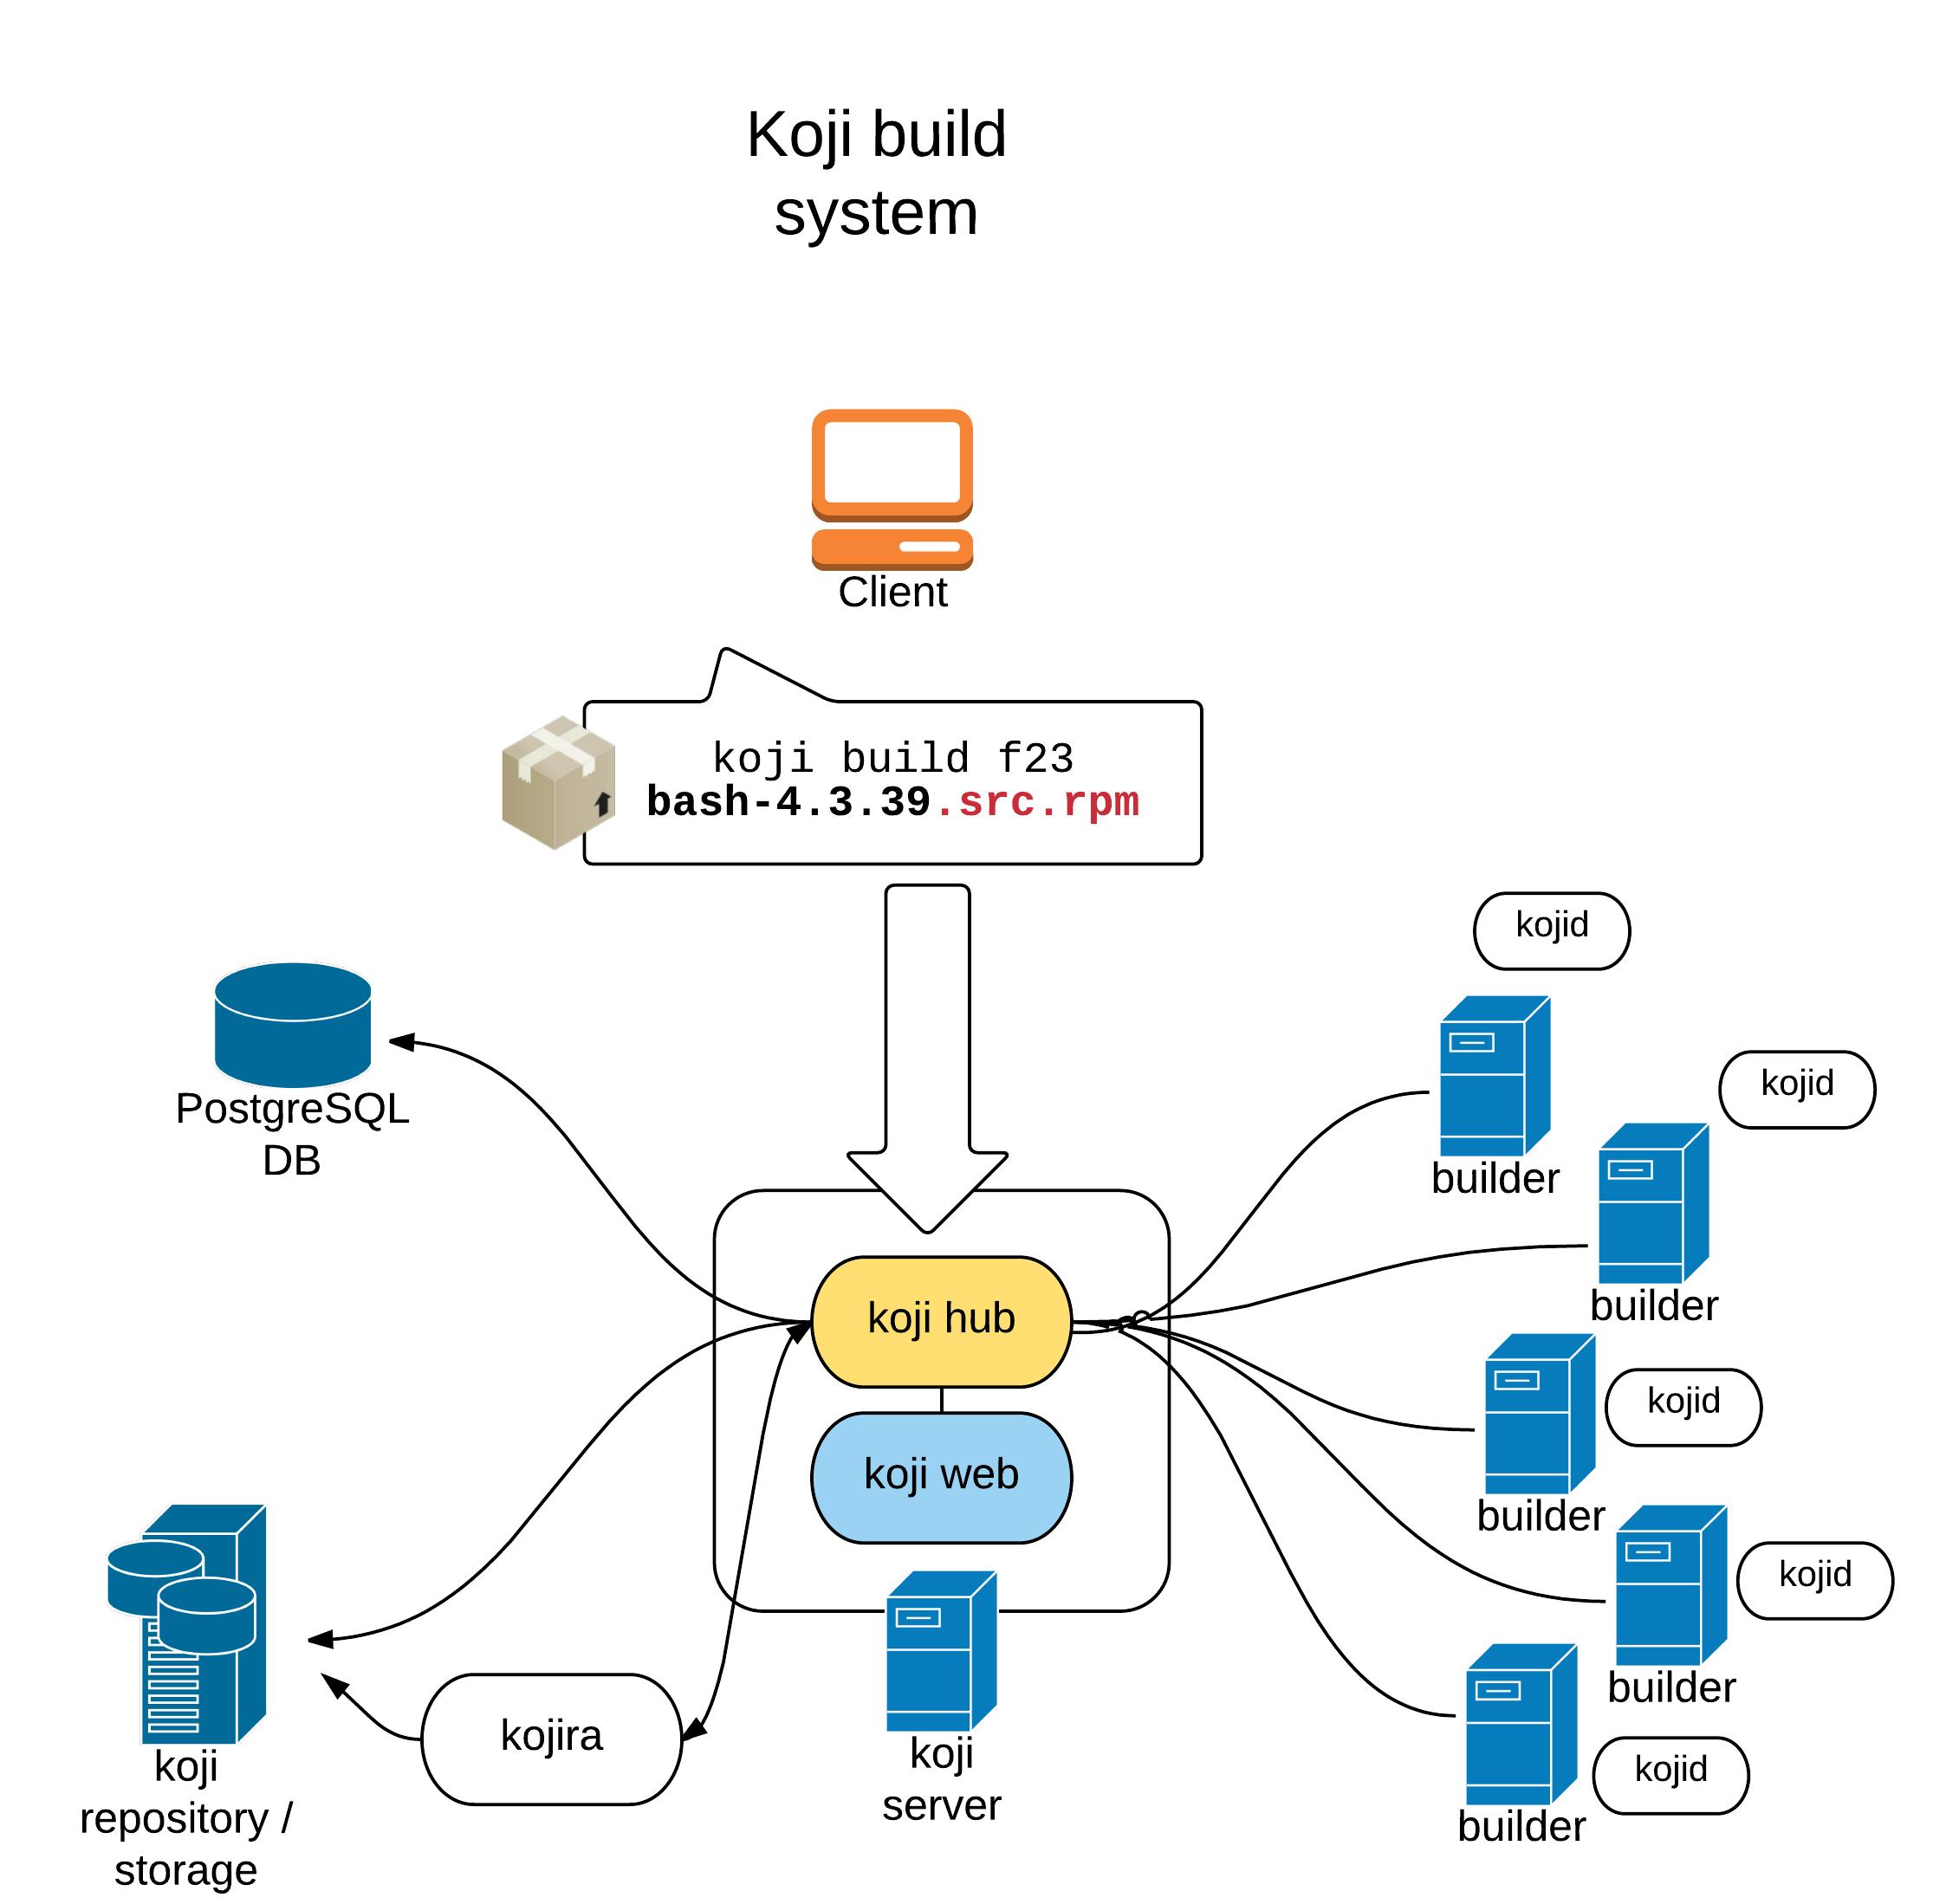 Koji build system graph